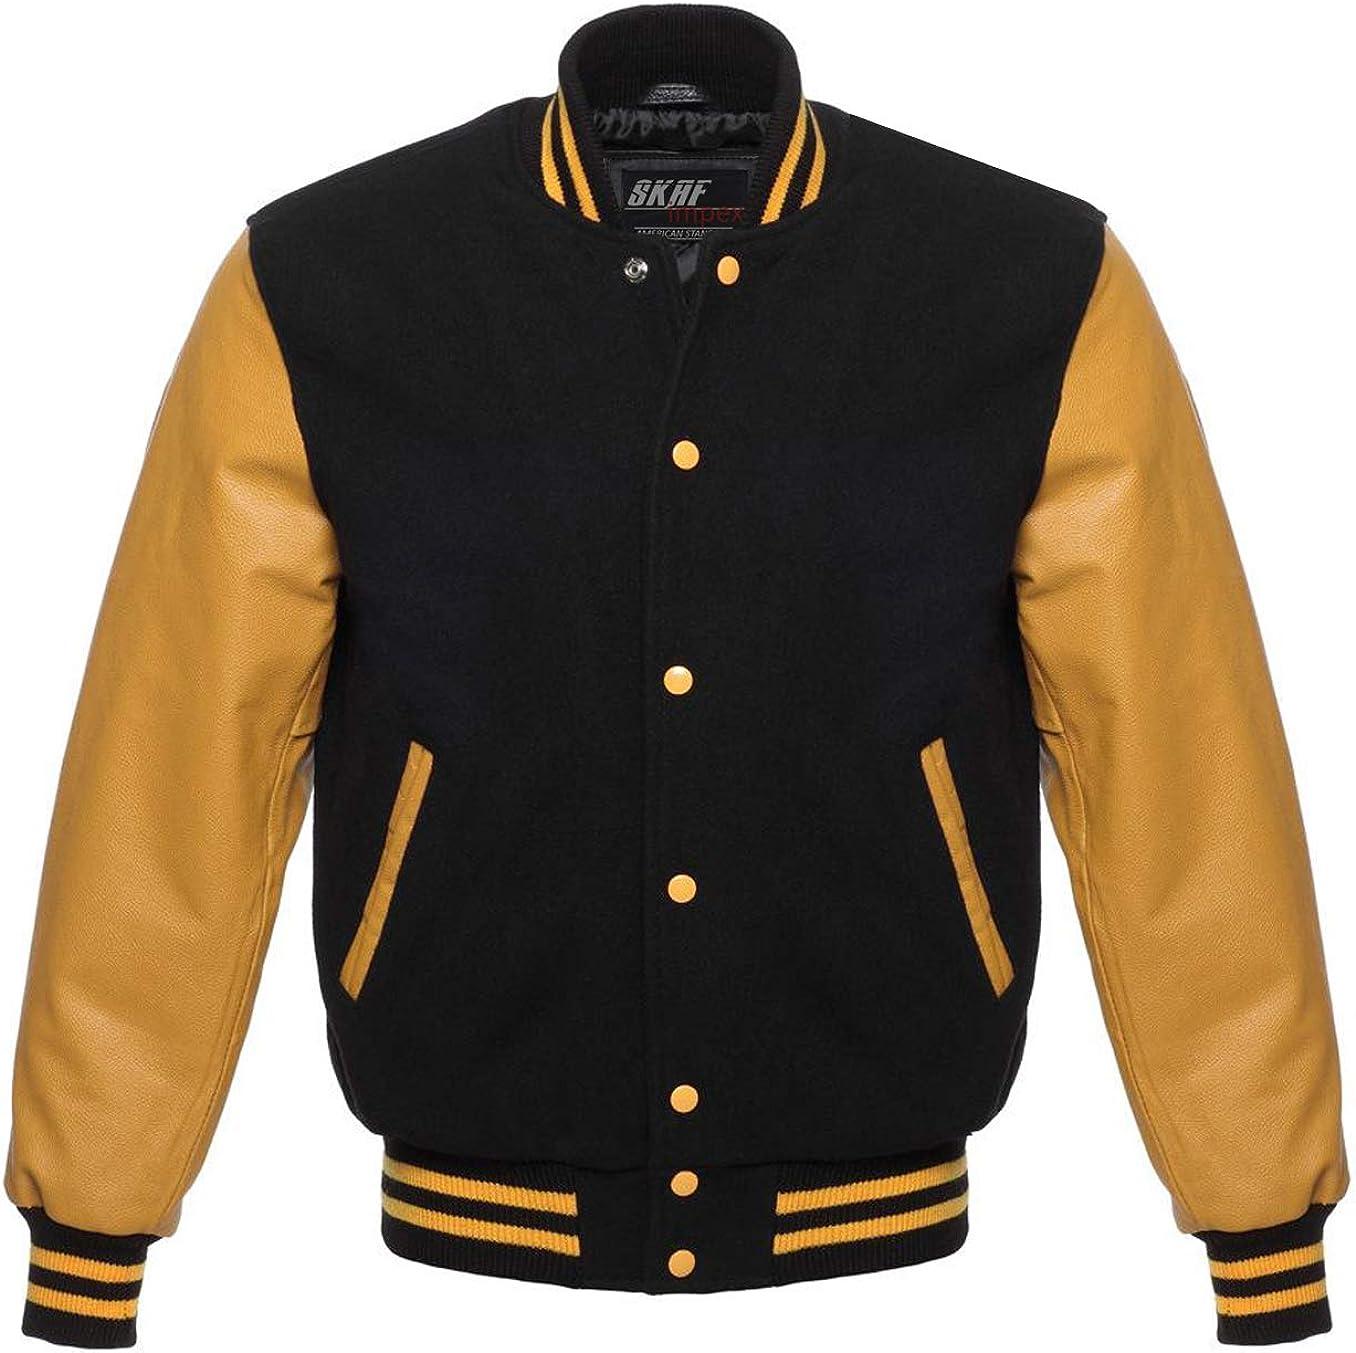 RED Pure Leather Sleeves BLACK Wool Varsity Letterman Bomber BASEBALL Jacket